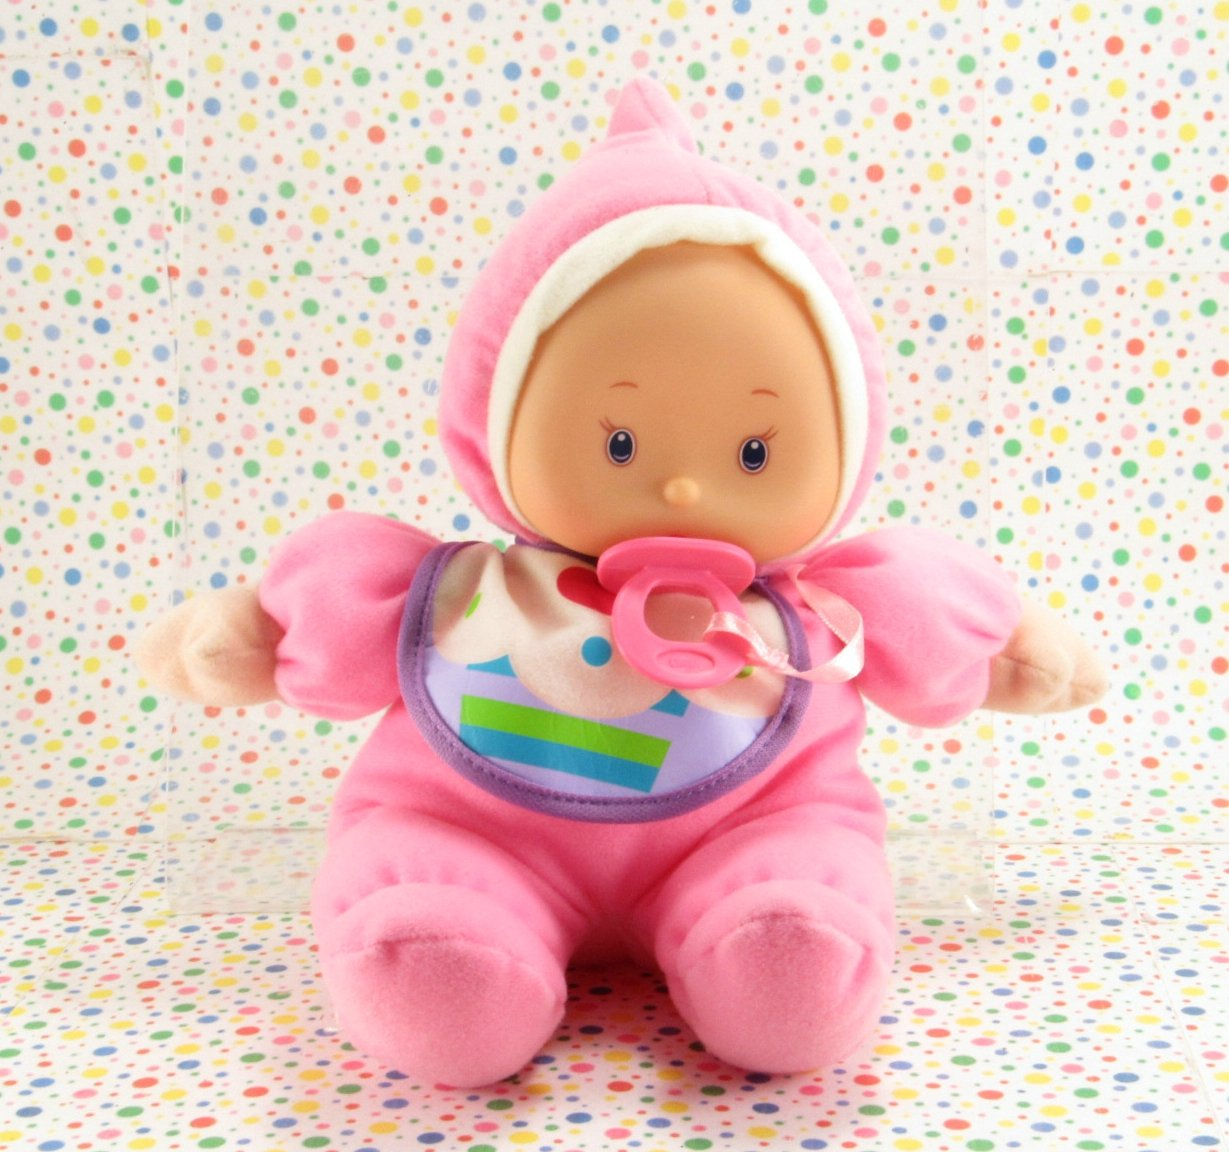 My Sweet Love Soft Baby Doll Pink Cupcake Bib City Toy Baby Doll Lovie